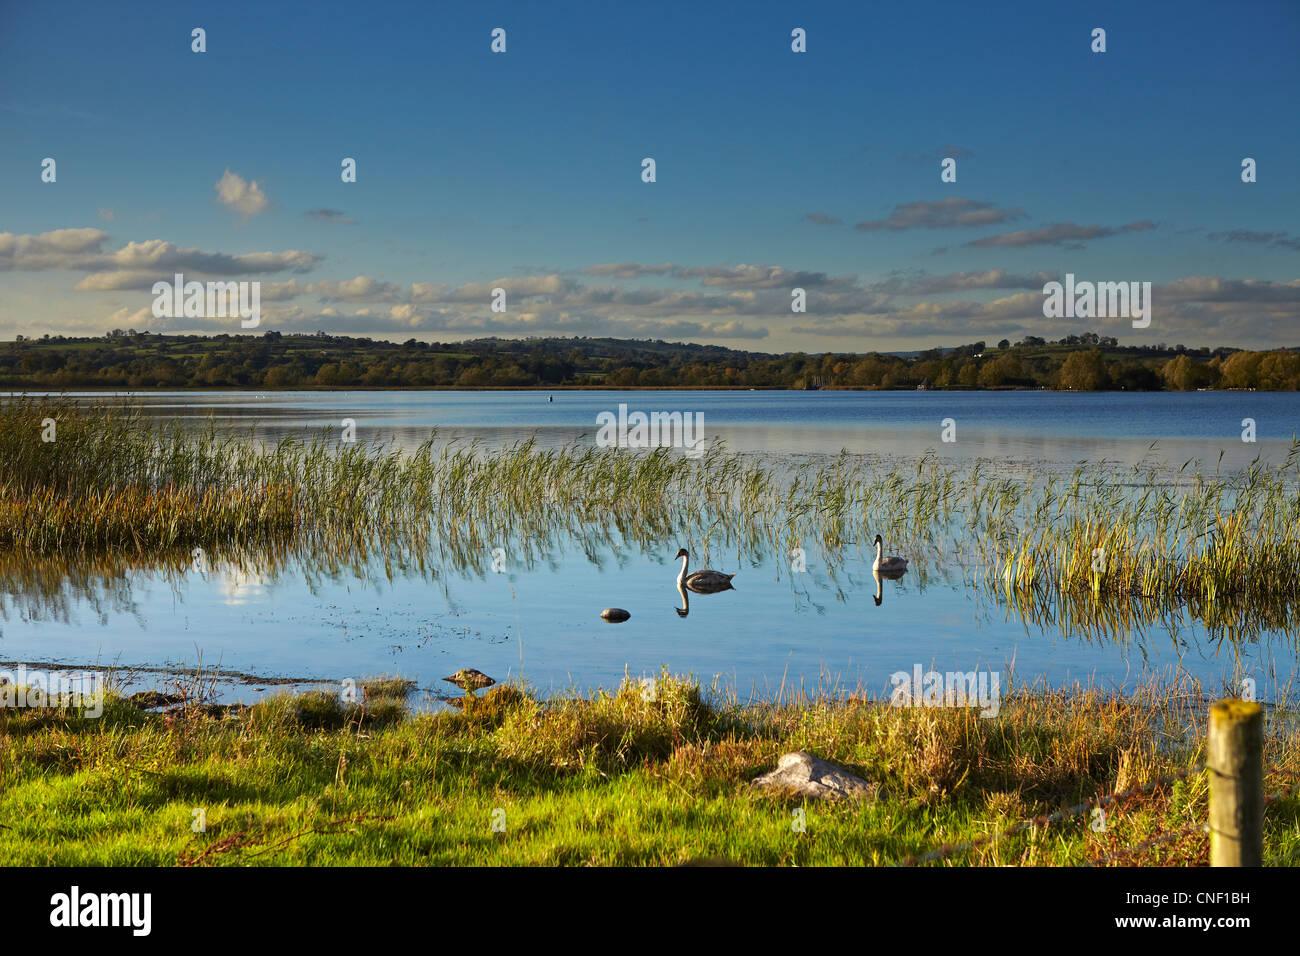 Schwäne am Llangorse See, Brecon Beacons National Park, Wales, UK Stockbild